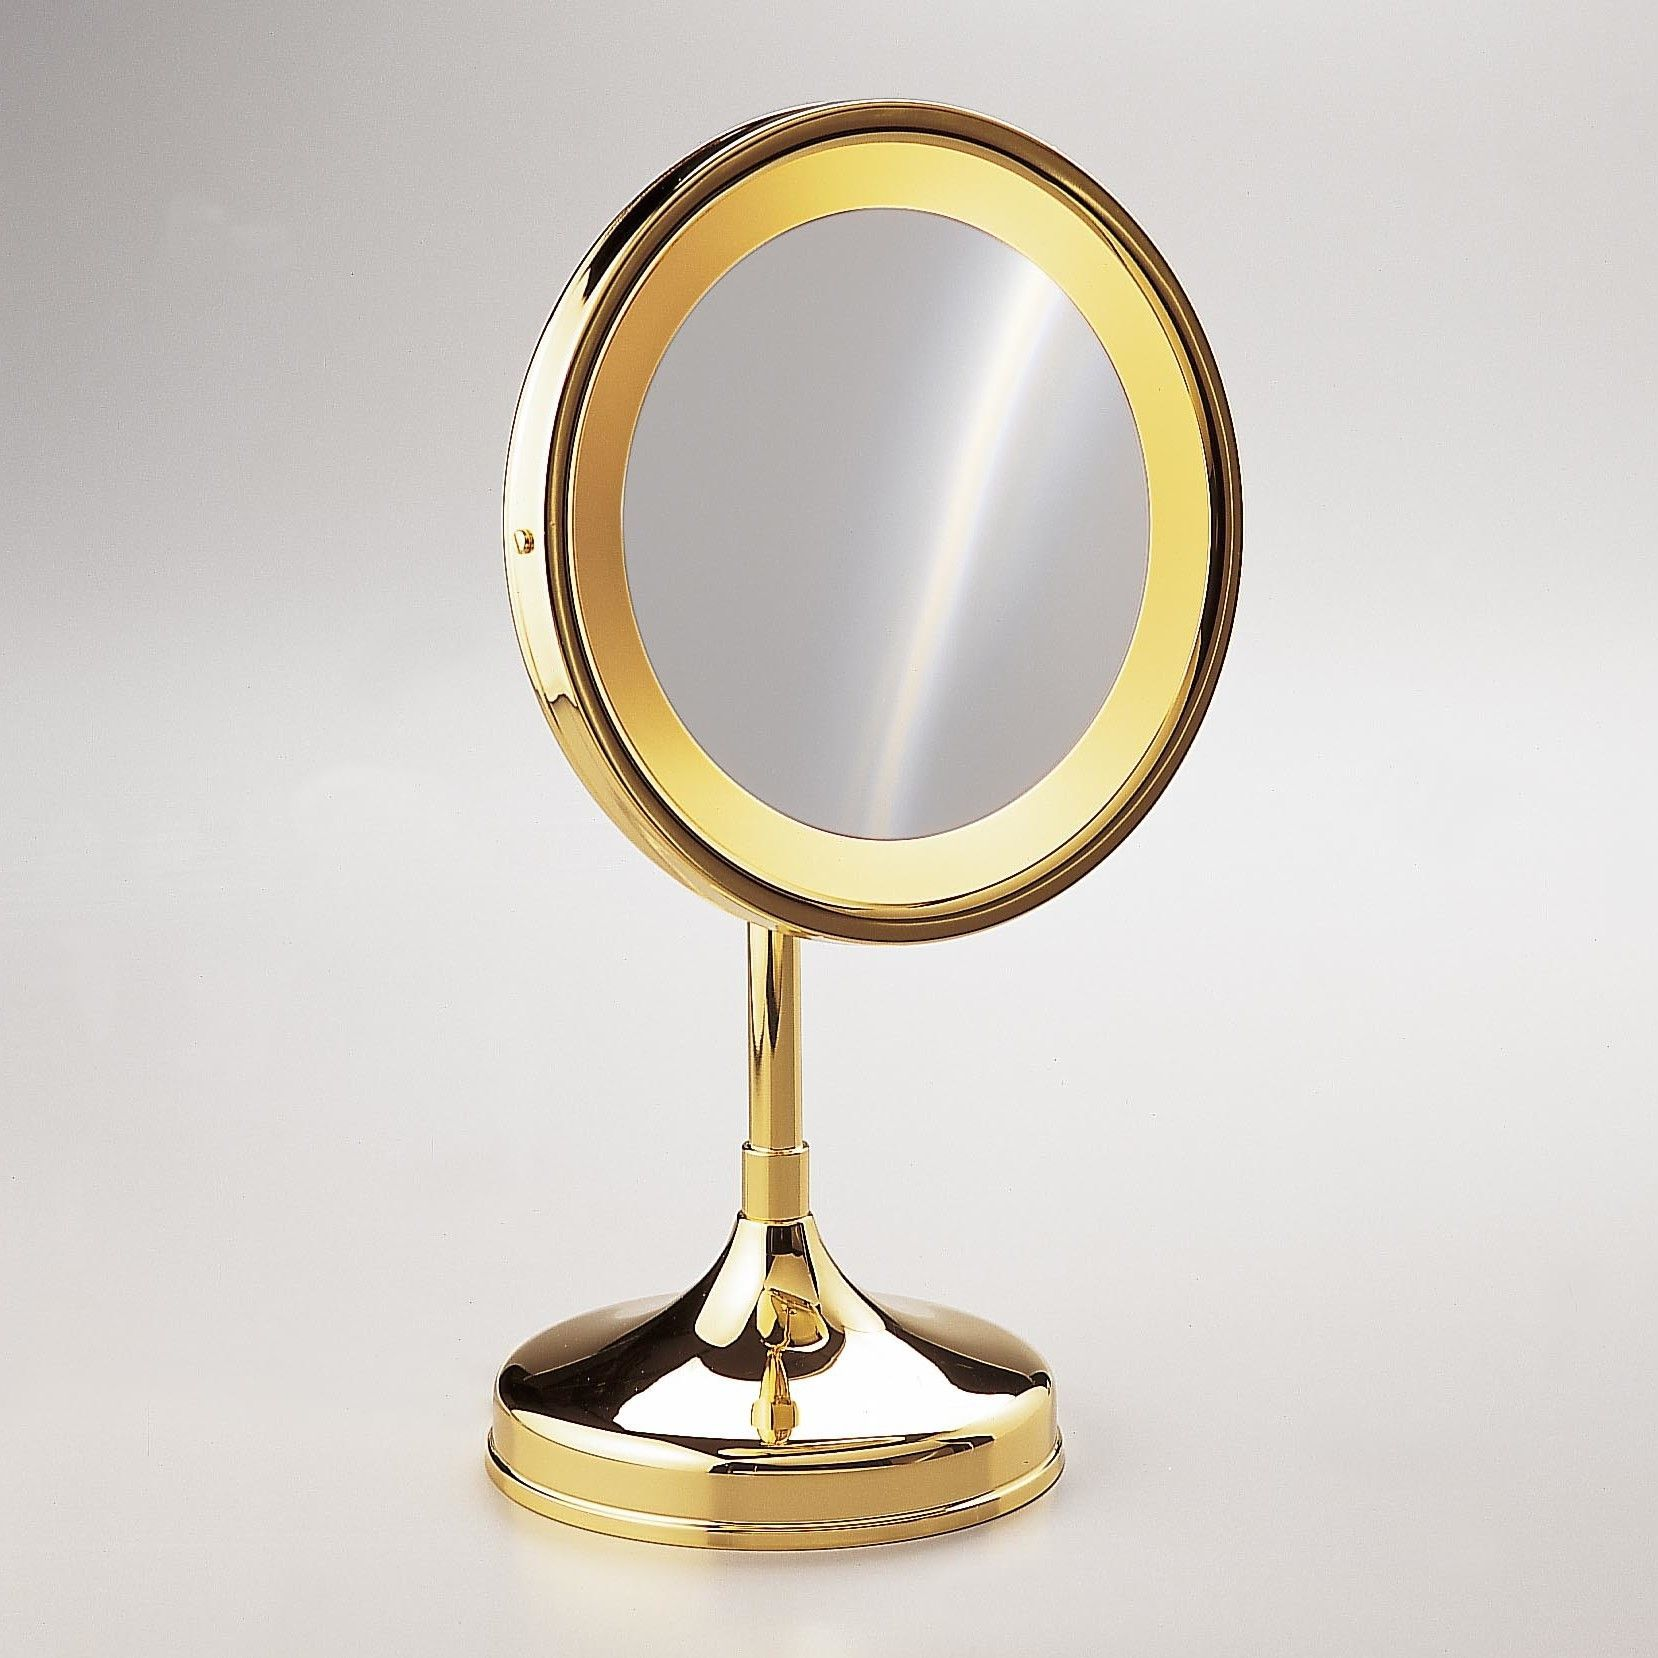 Round Pedestal Magnifying Mirror   Pedestal, Magnifying mirror and ...